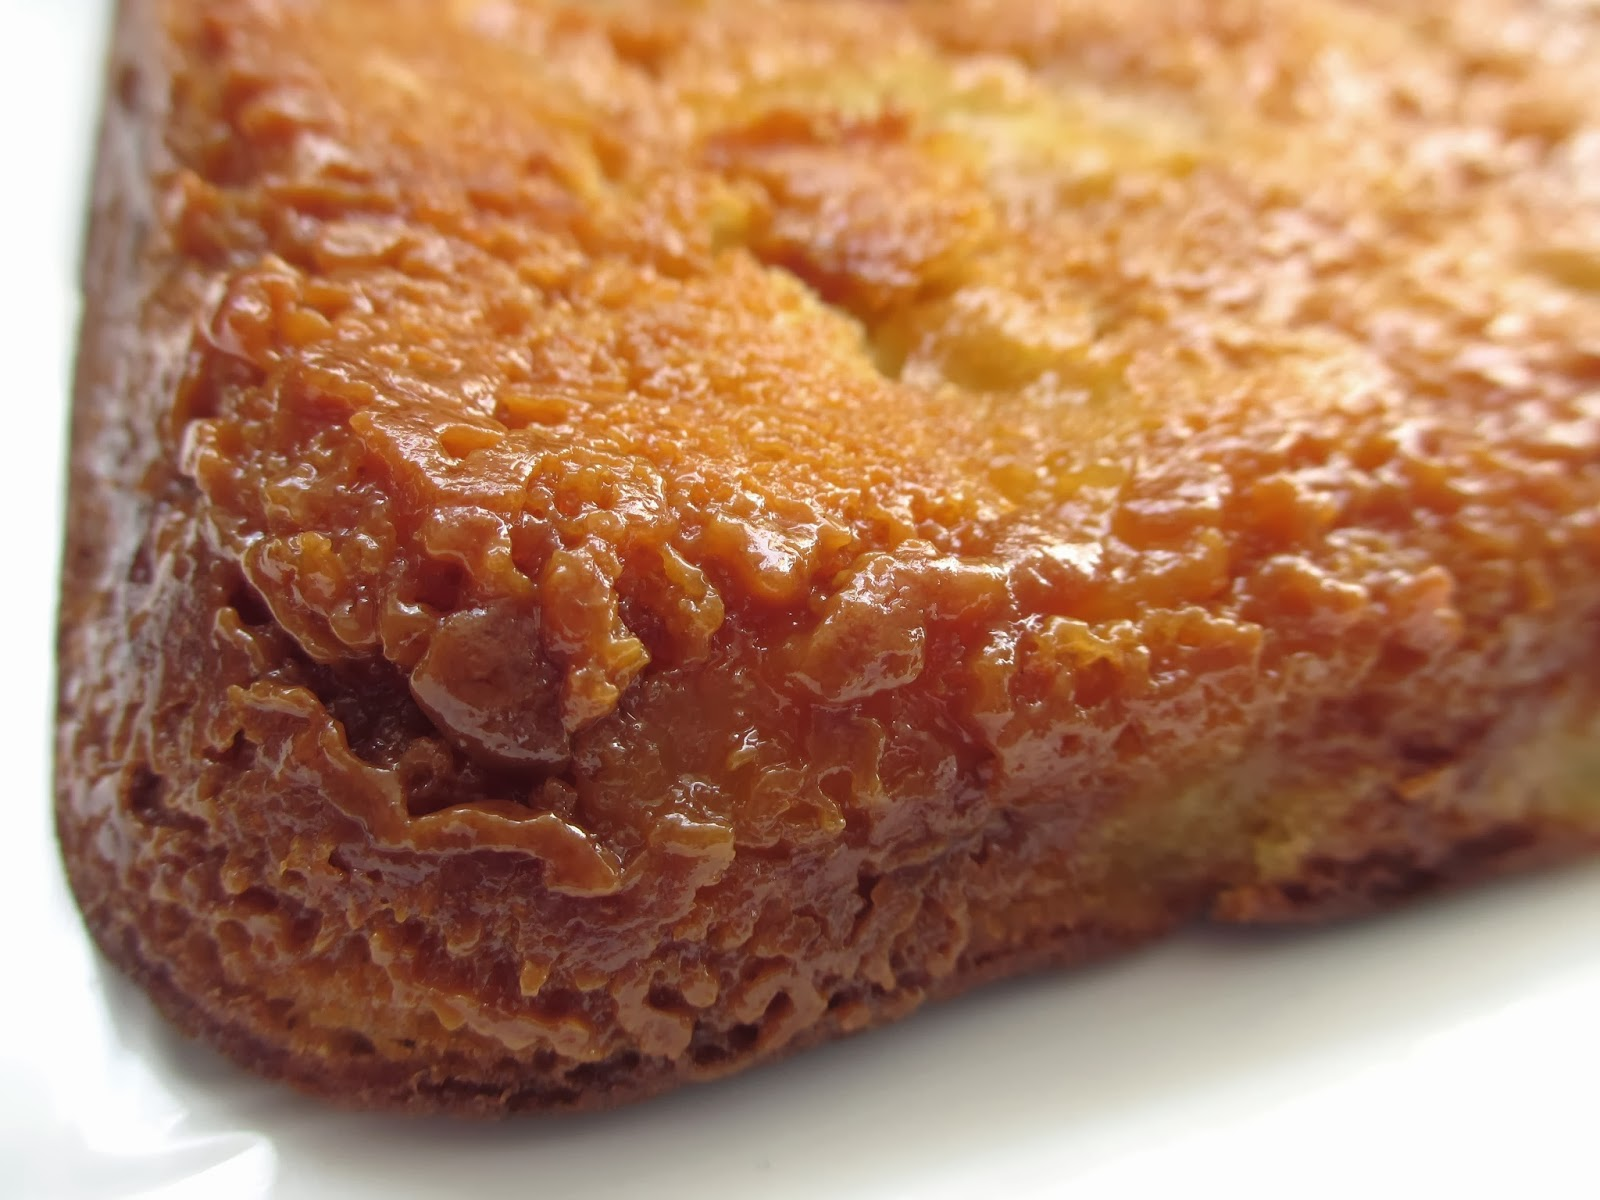 Gateau pomme caramel beurre sale thermomix